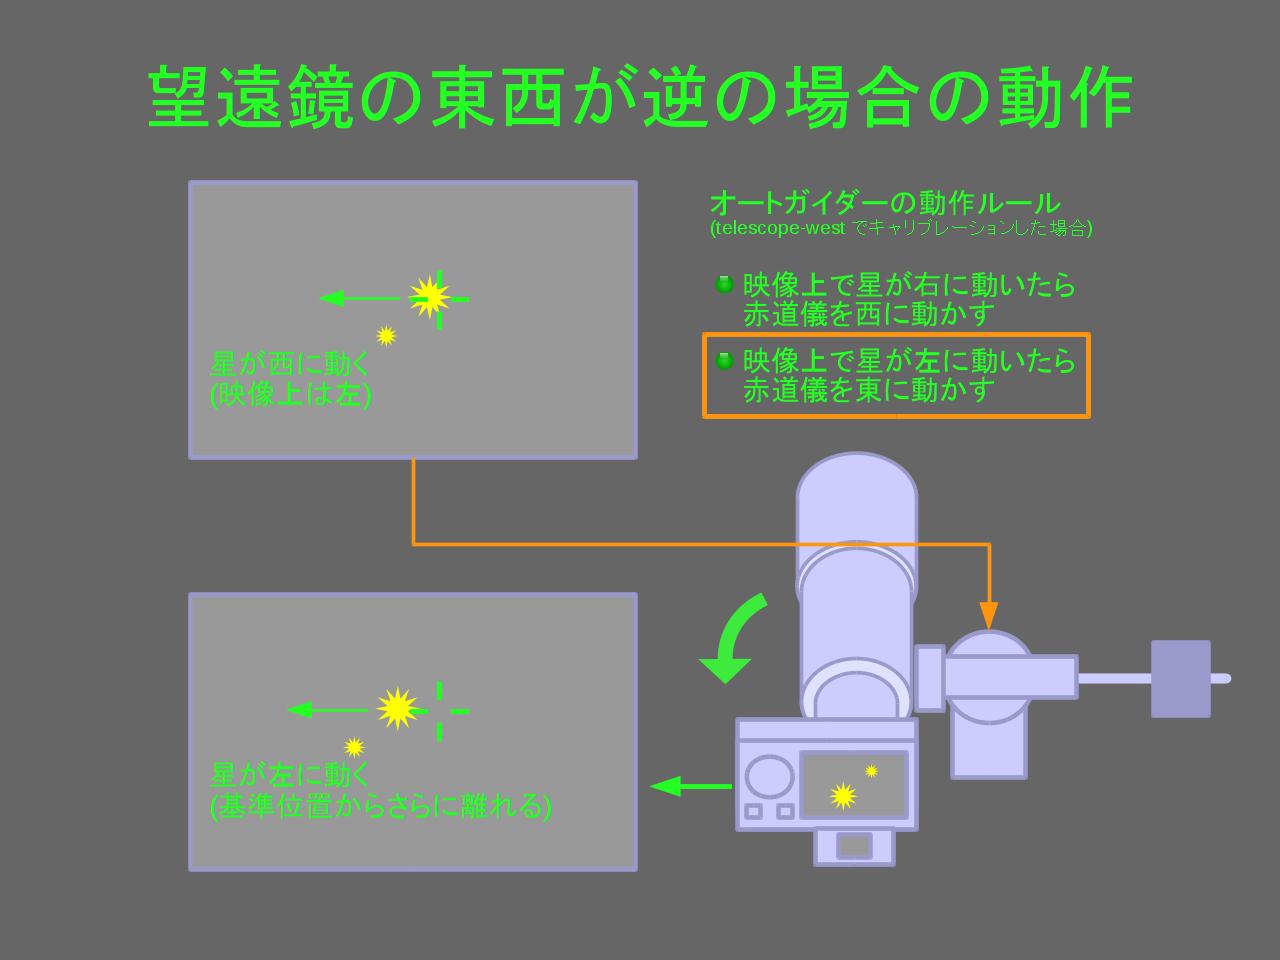 http://rna.sakura.ne.jp/share/telescope-flip-05.png